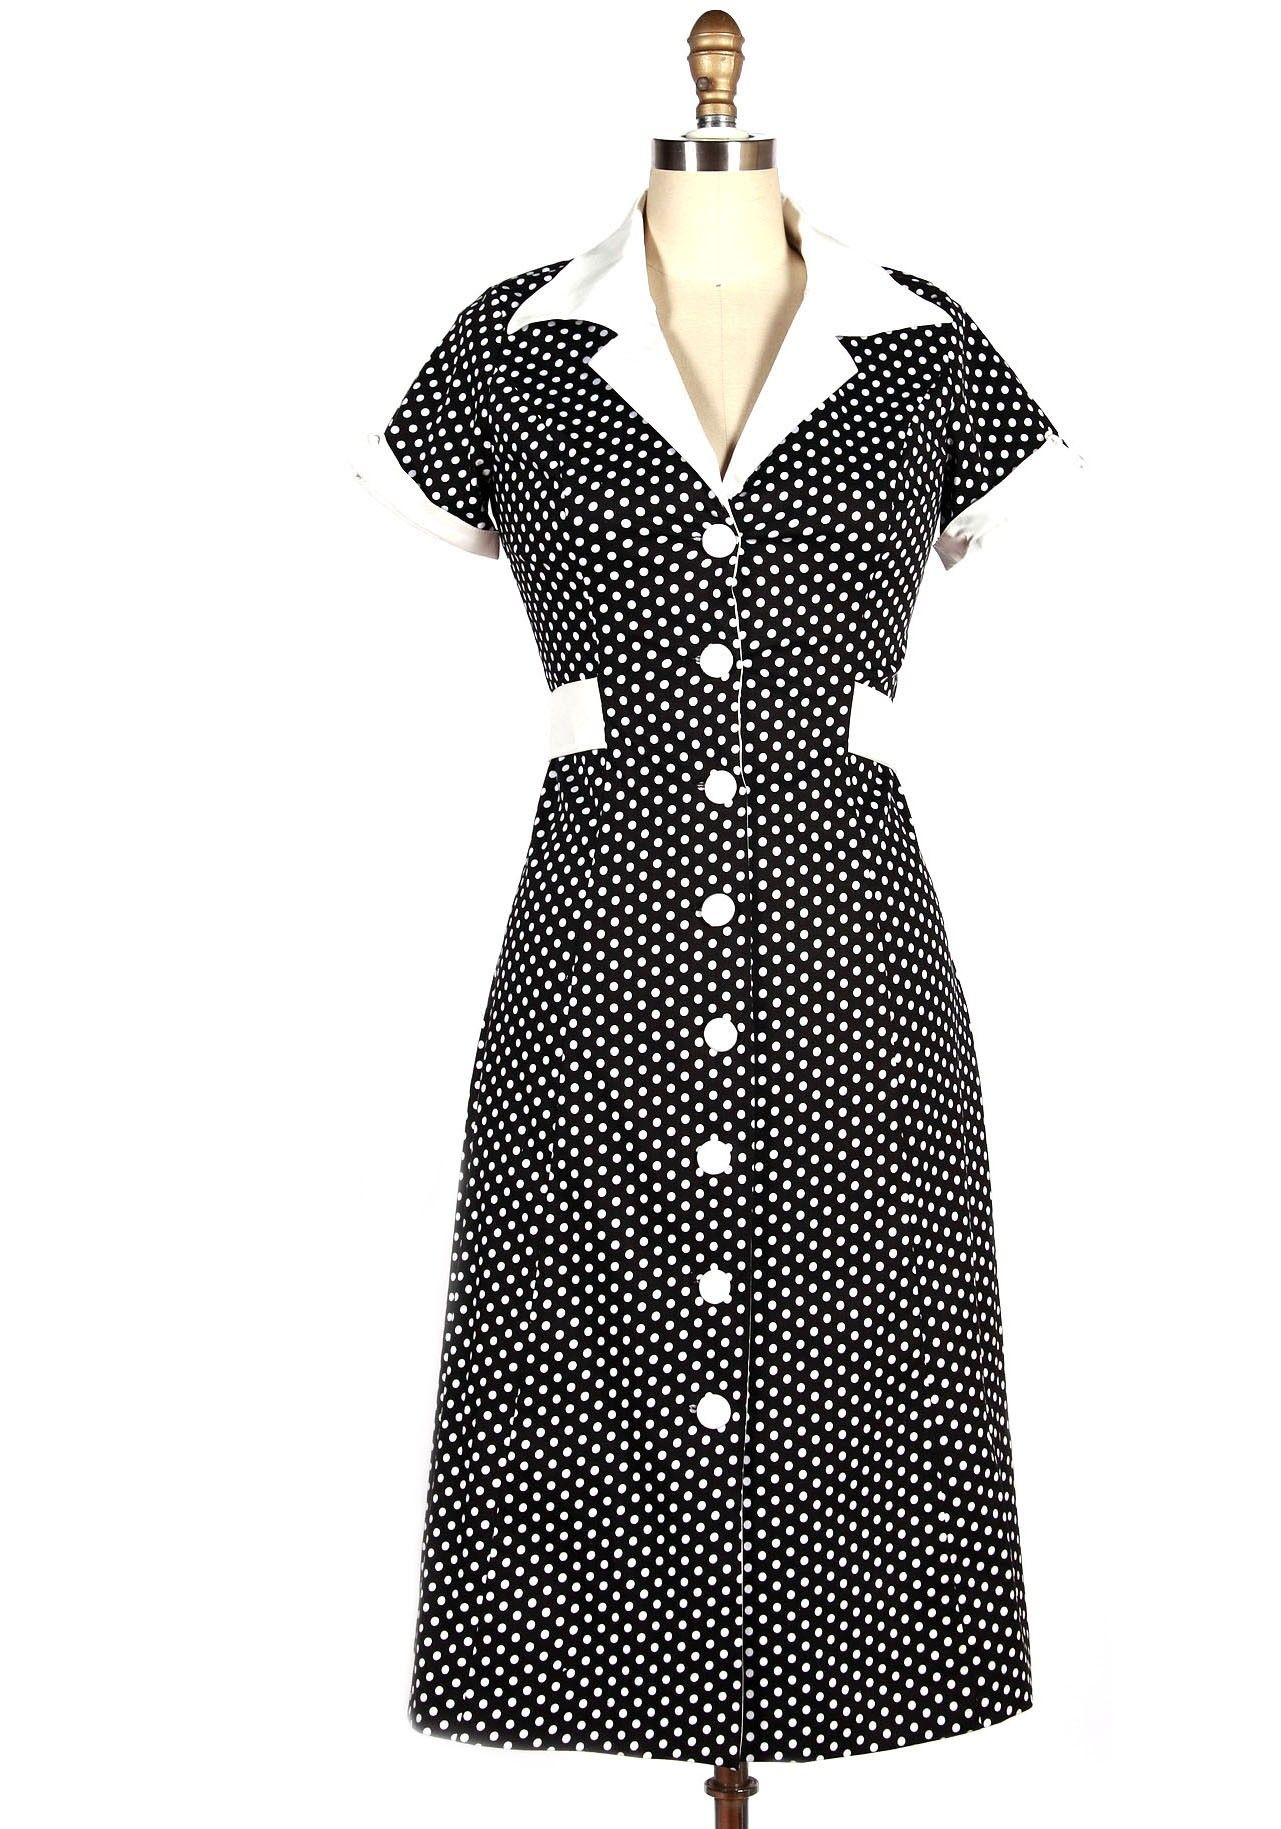 Audrey hepburns stylepin up girlevening dressprom dressblack